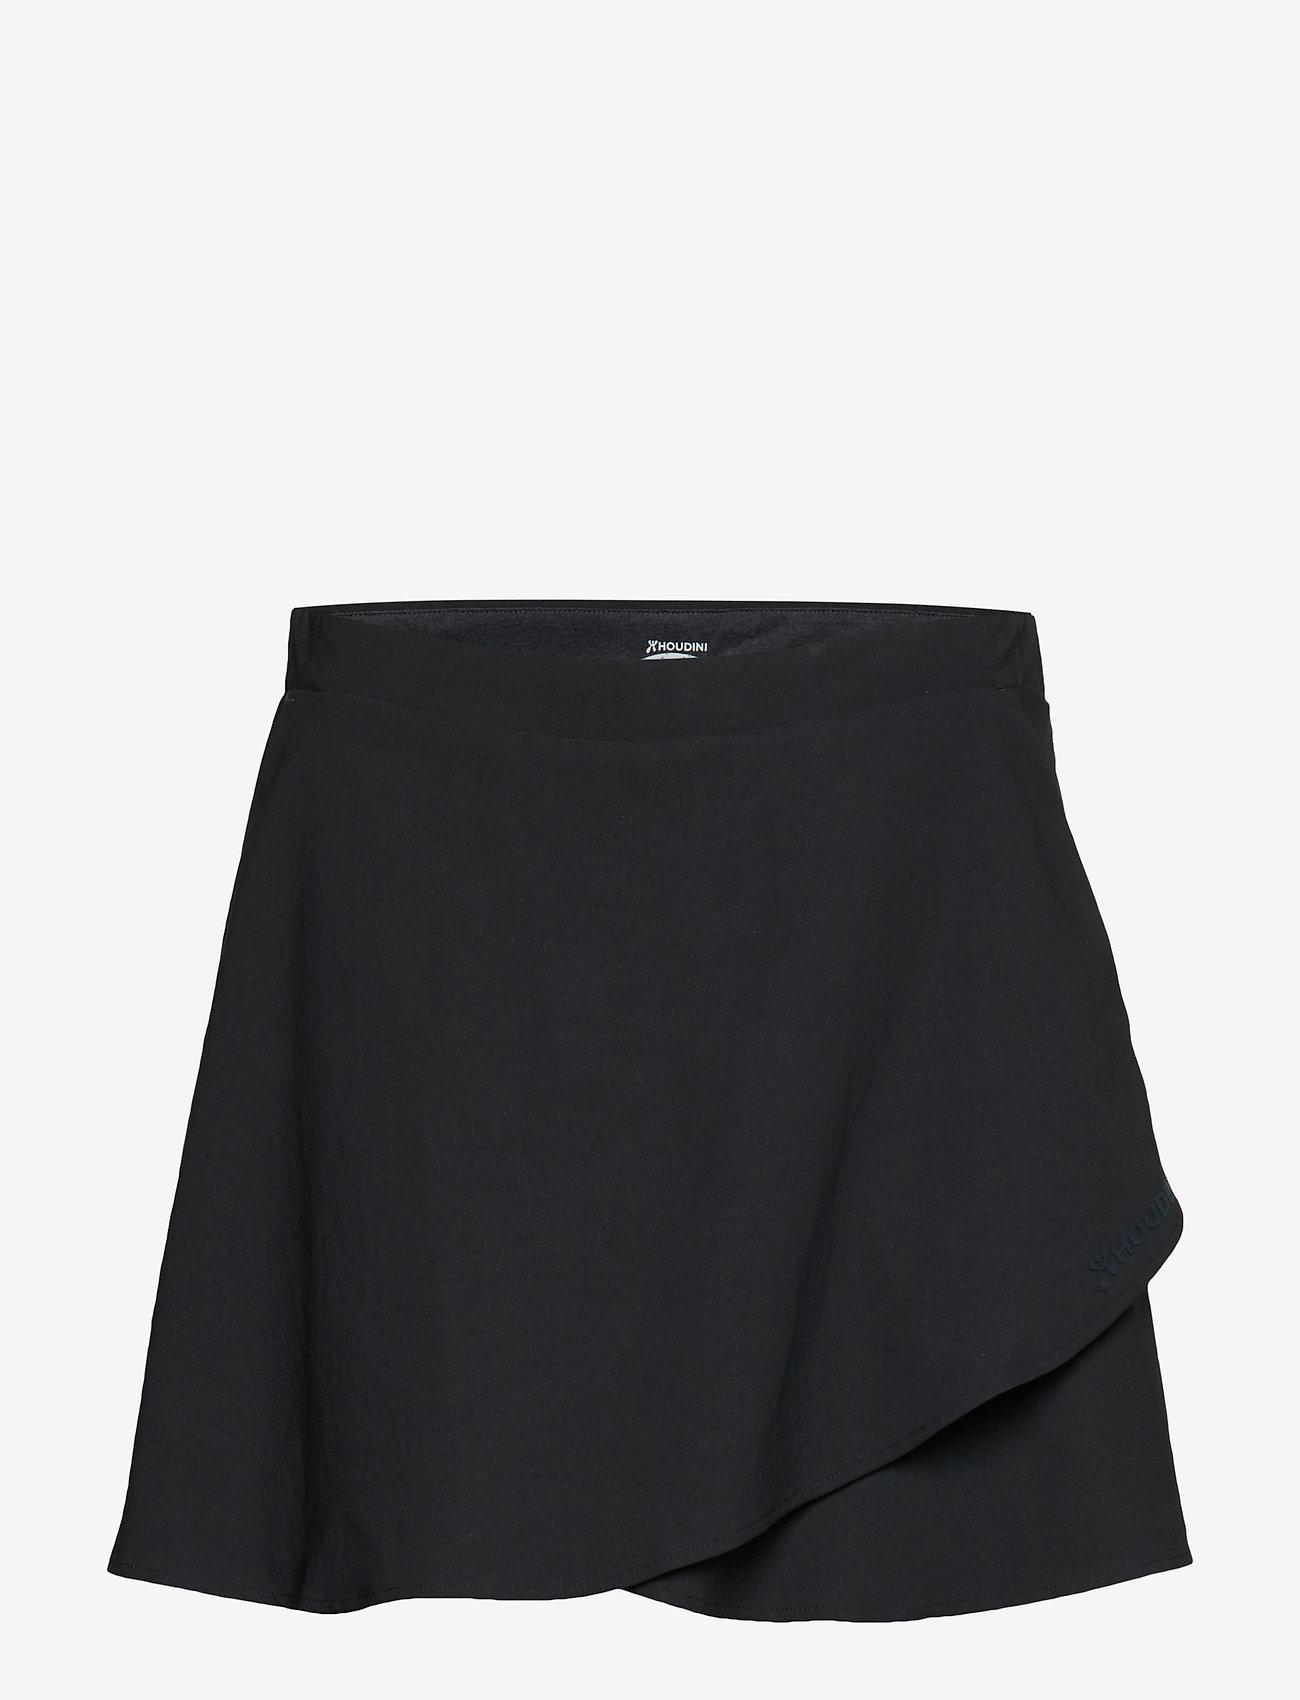 Houdini - W's Skort - sports skirts - true black